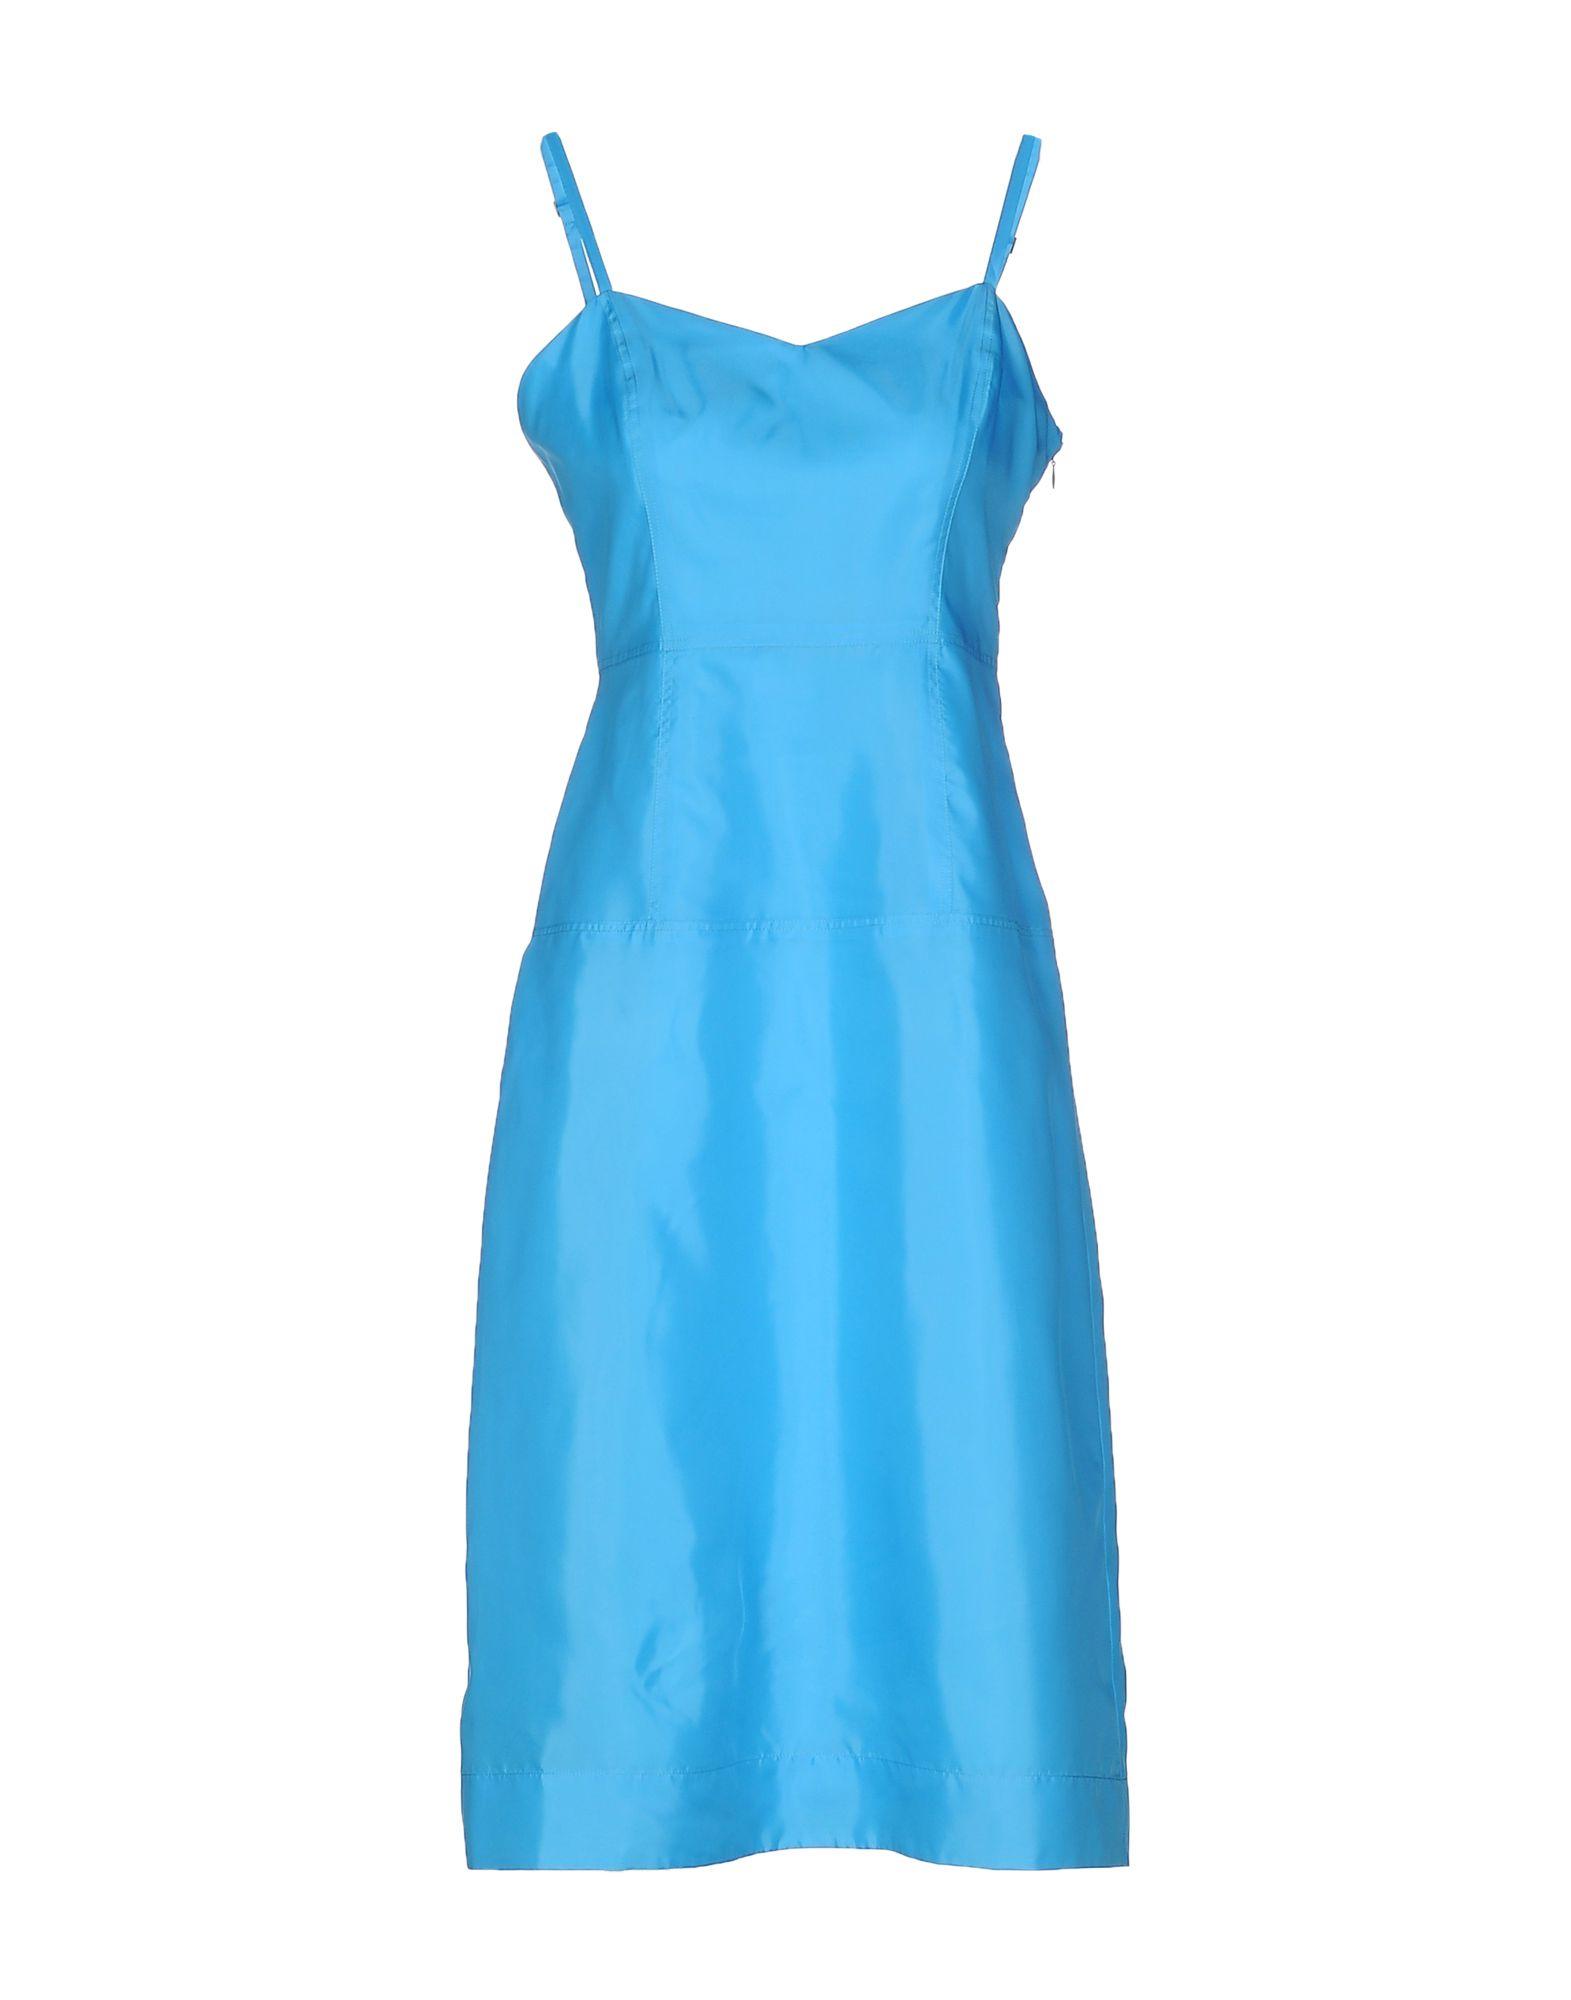 MARC BY MARC JACOBS Платье длиной 3/4 духи marc jacobs daisy dream 4 10ml